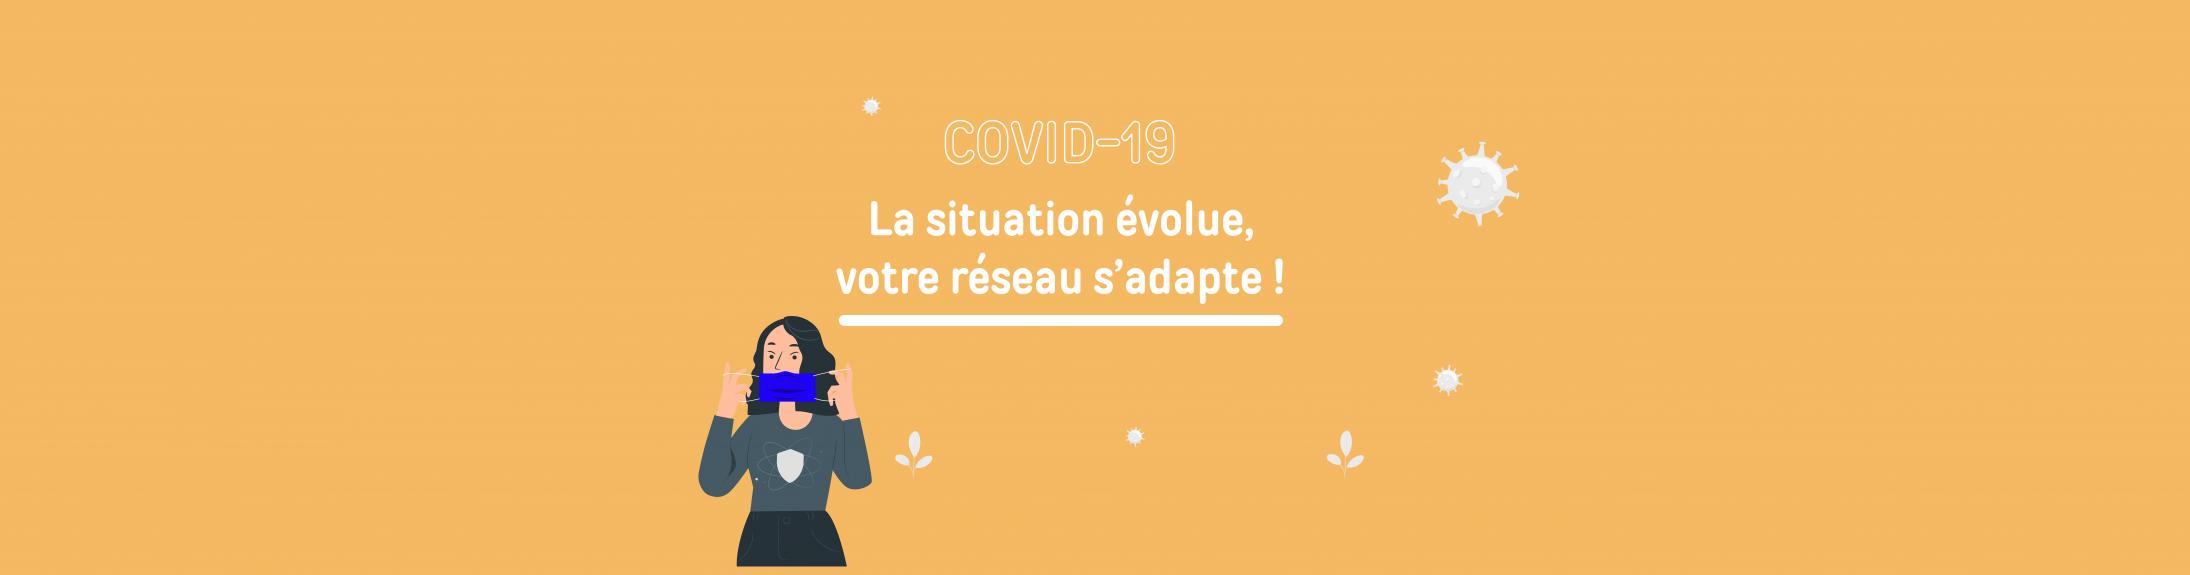 Covid-19 nouvelles mesures